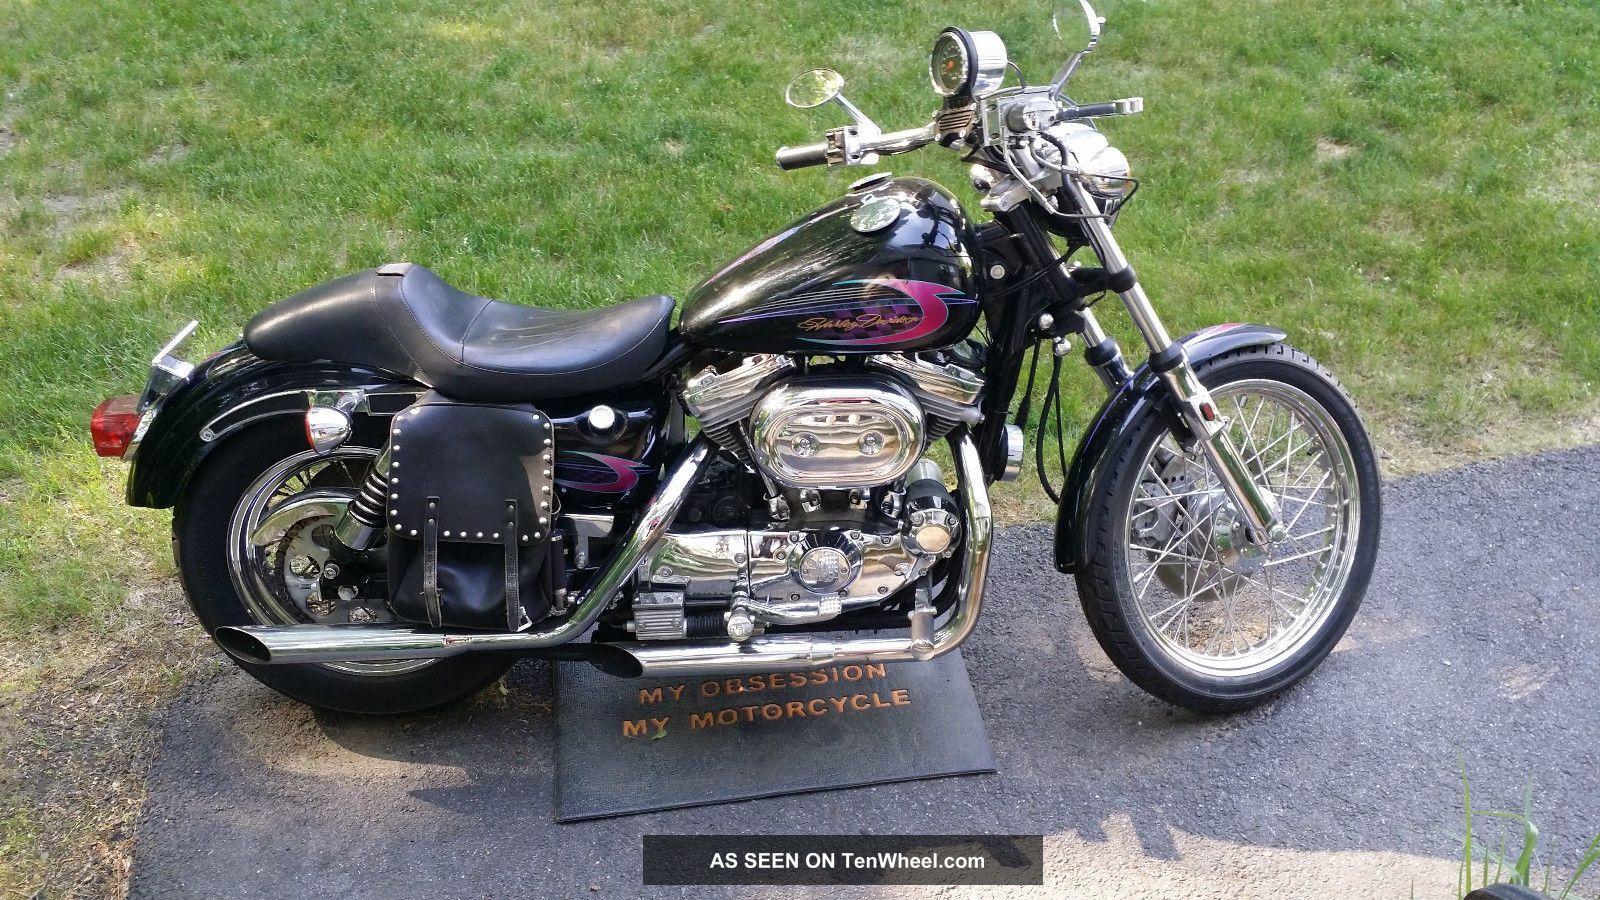 1986 Harley 883 / 1200 Custom Built & Paint By Jay Brakes